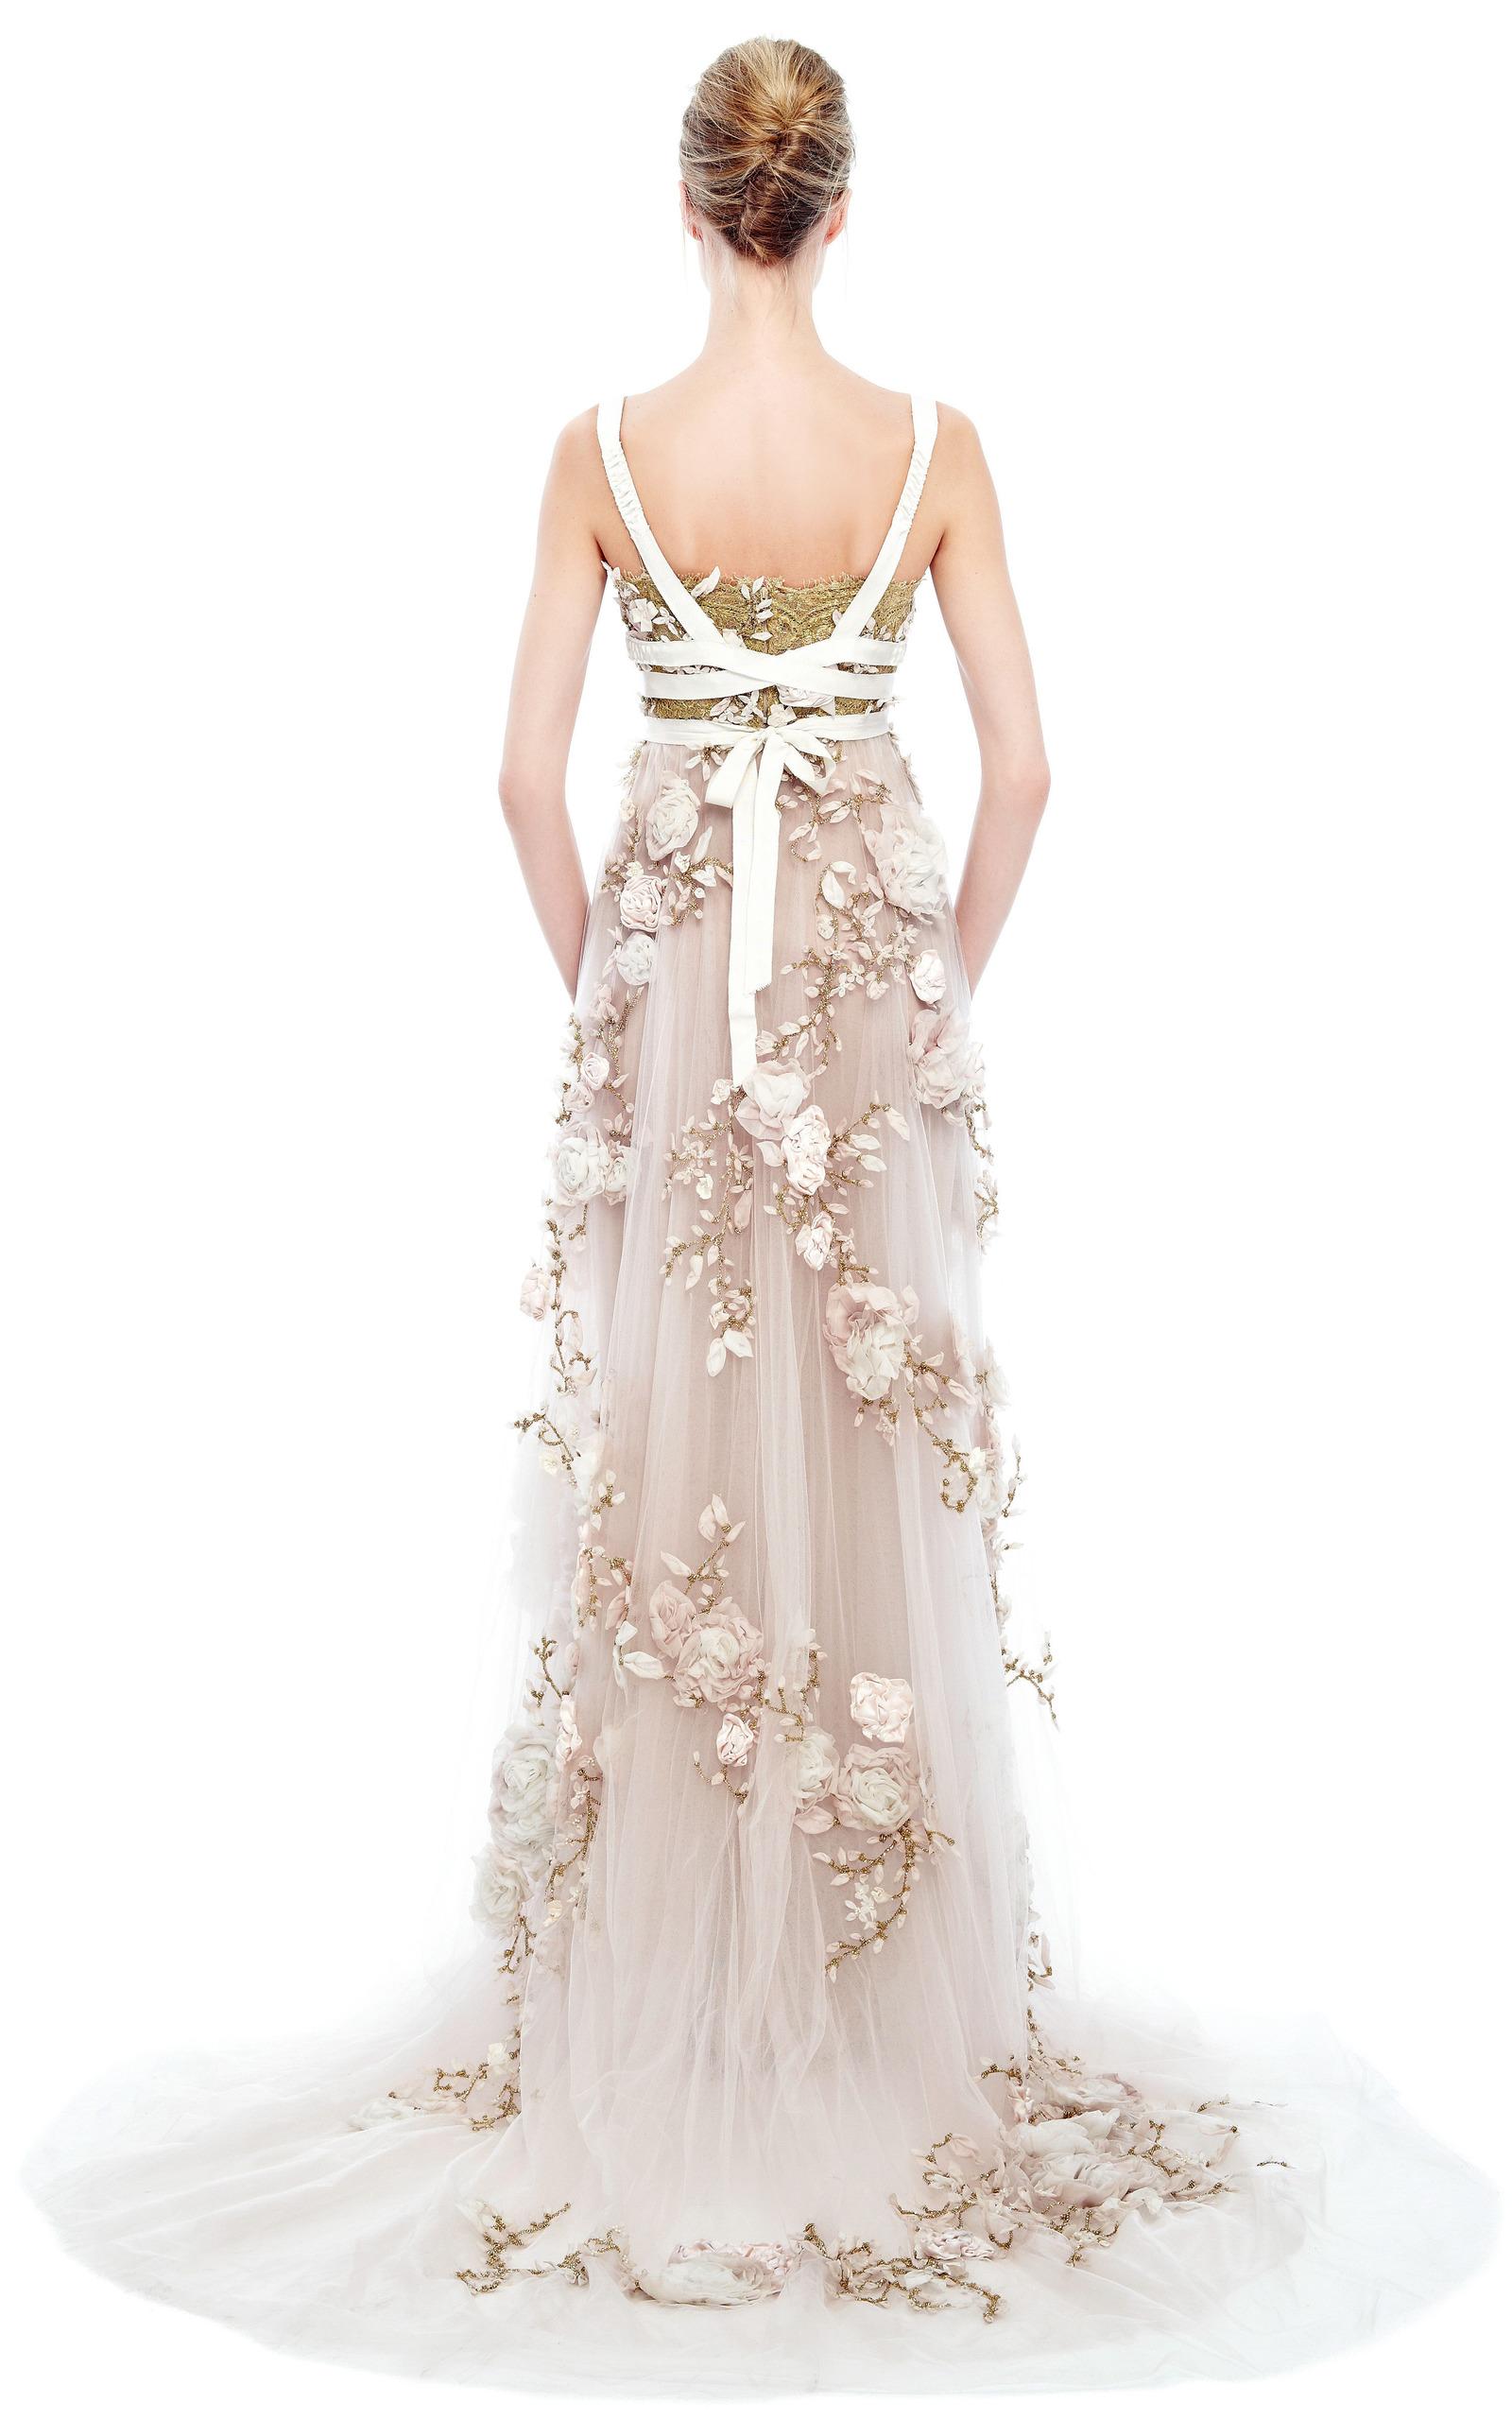 3D Silk Ribbon Rose Empire Waist Gown by Marchesa  Moda